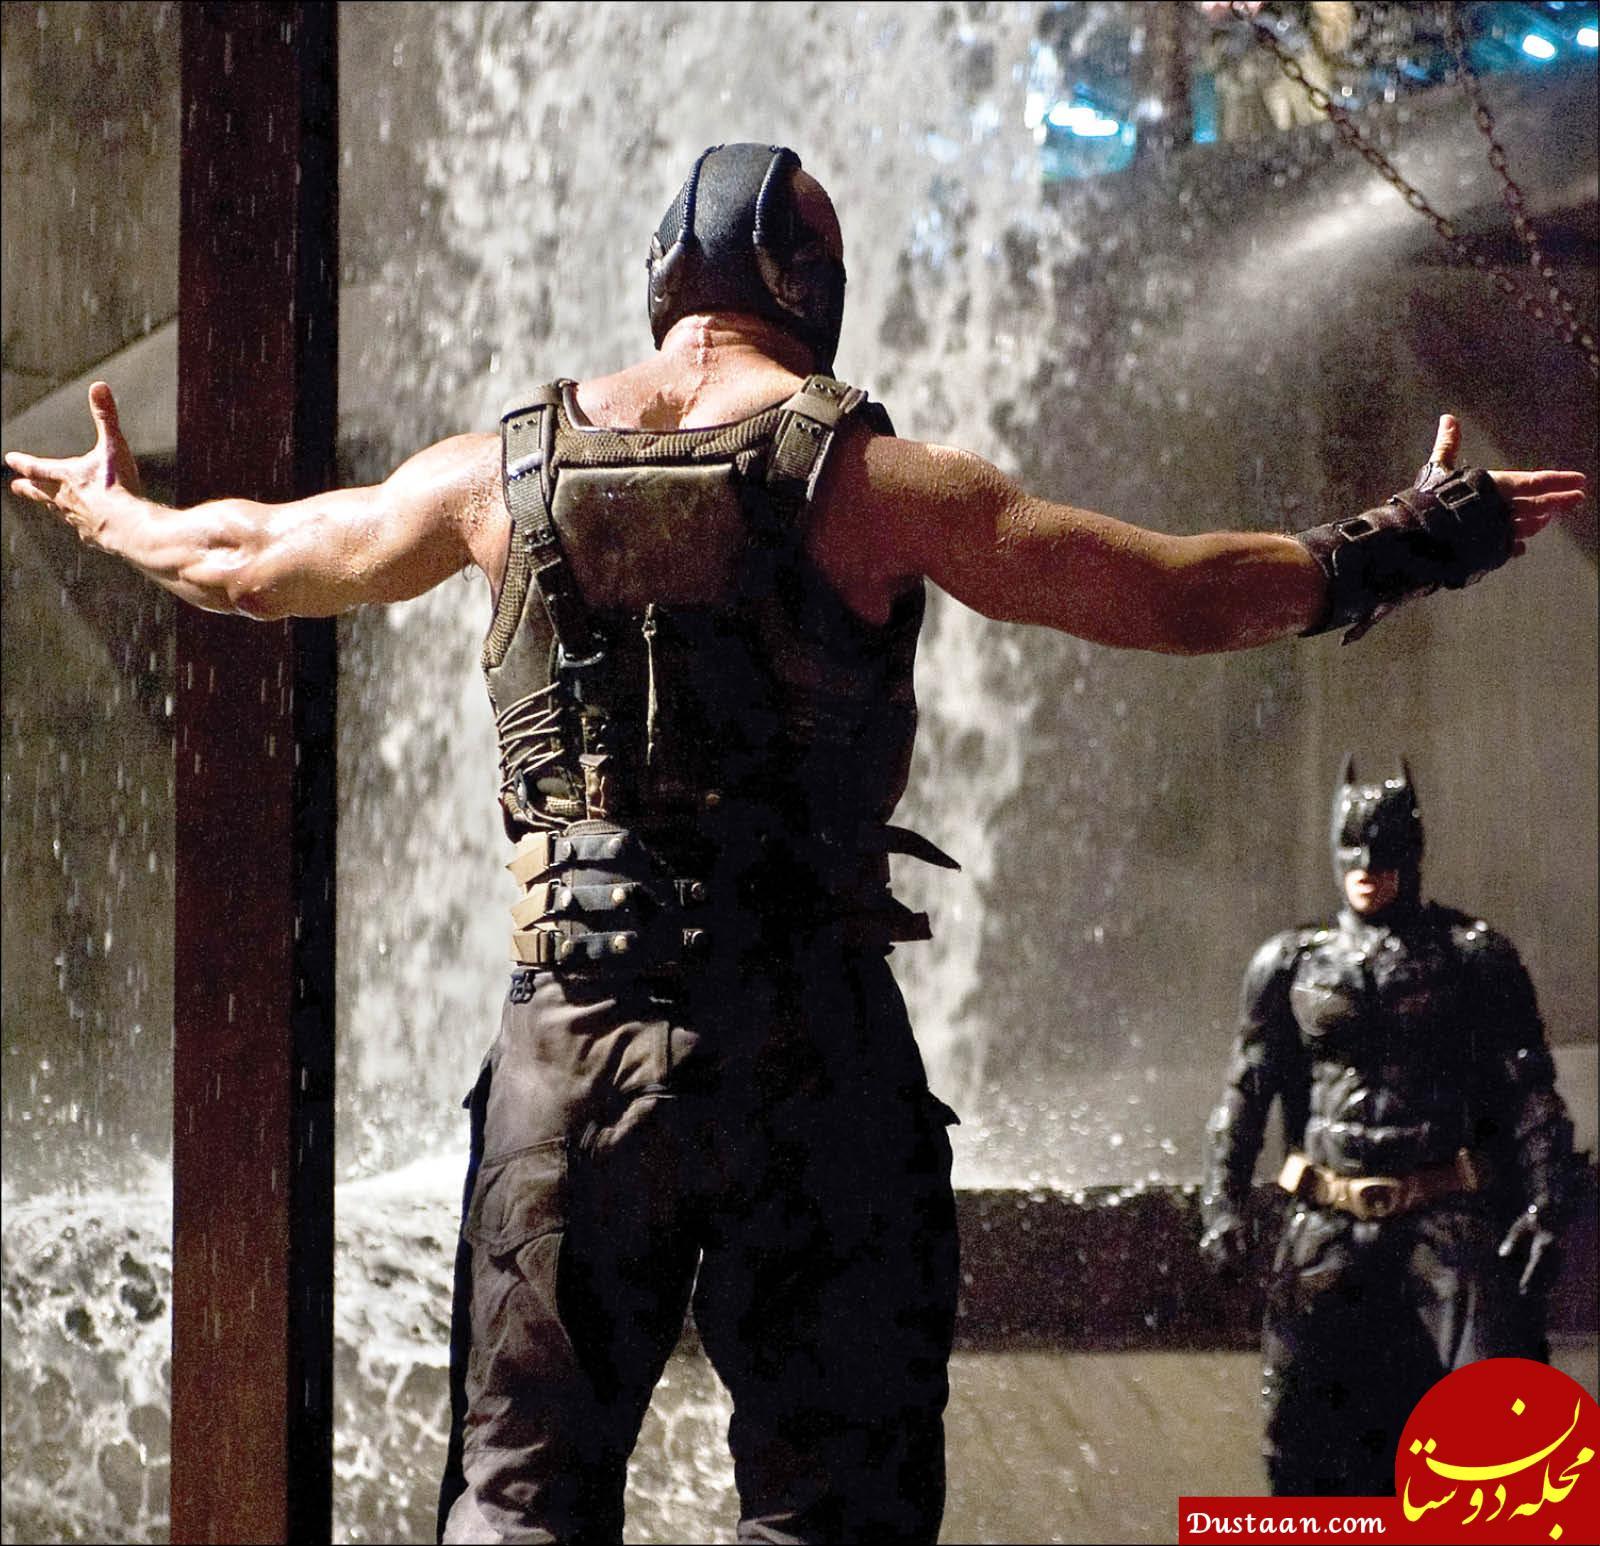 www.dustaan.com فیلم هایی که بدترین پایانهای تاریخ را داشته اند!